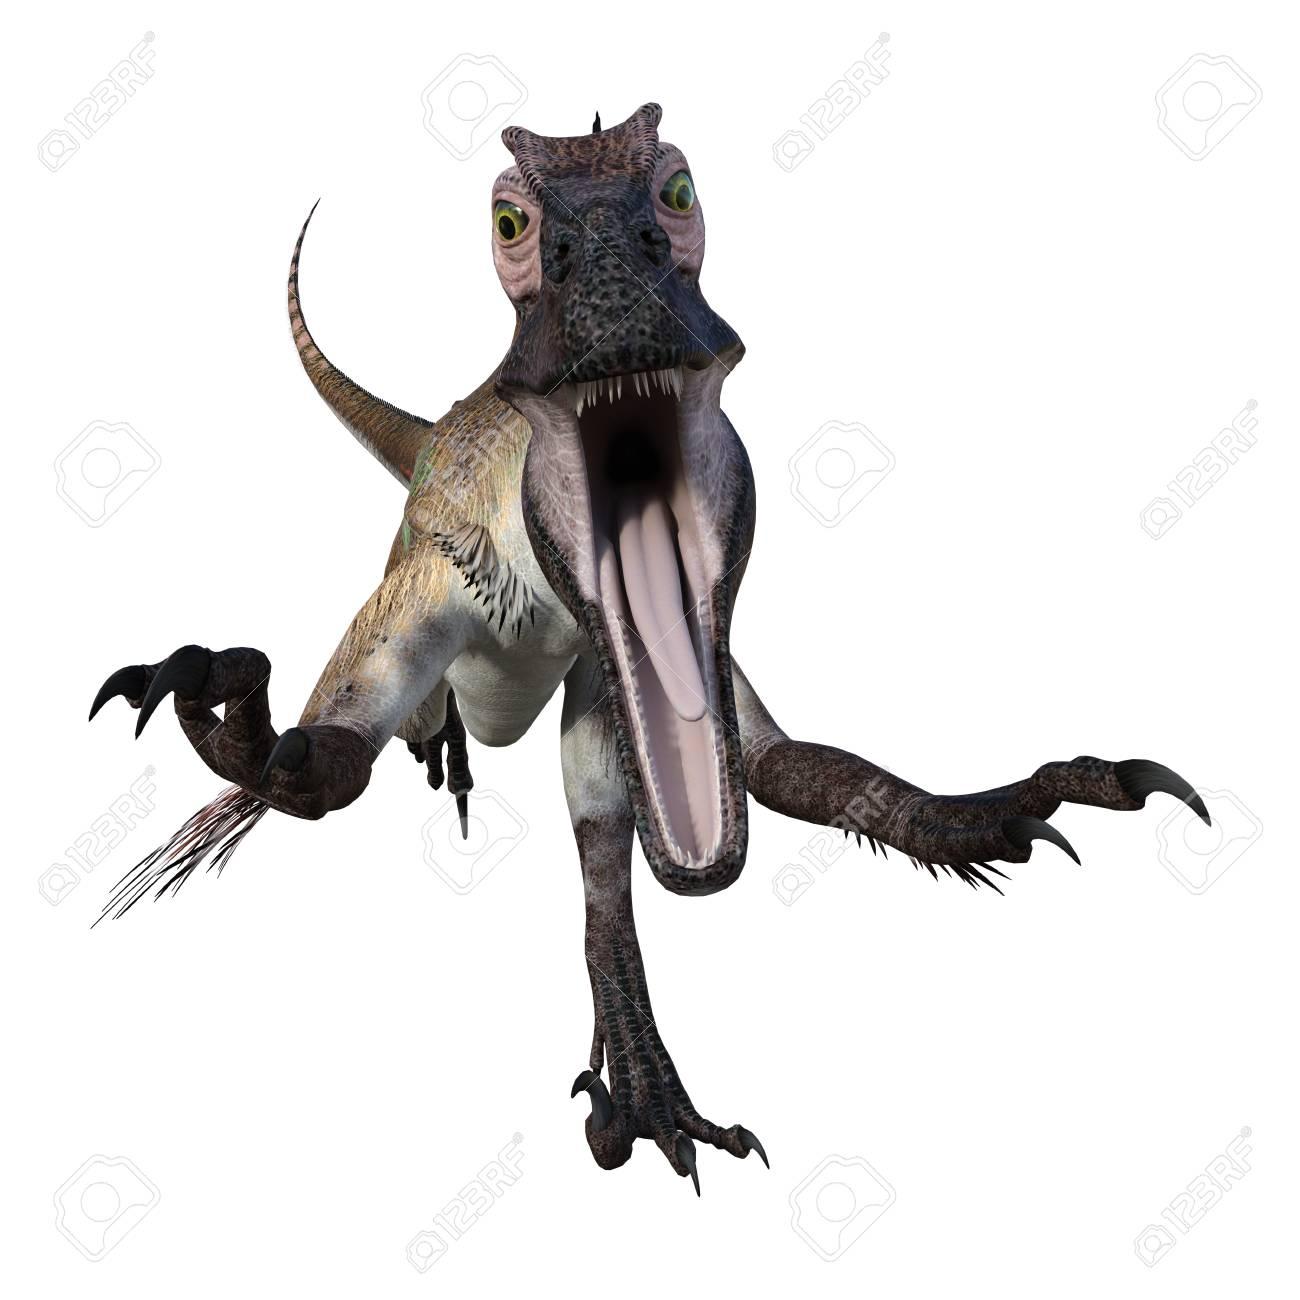 3D Rendering Of A Dinosaur Utahraptor Isolated On White Background 1300x1300